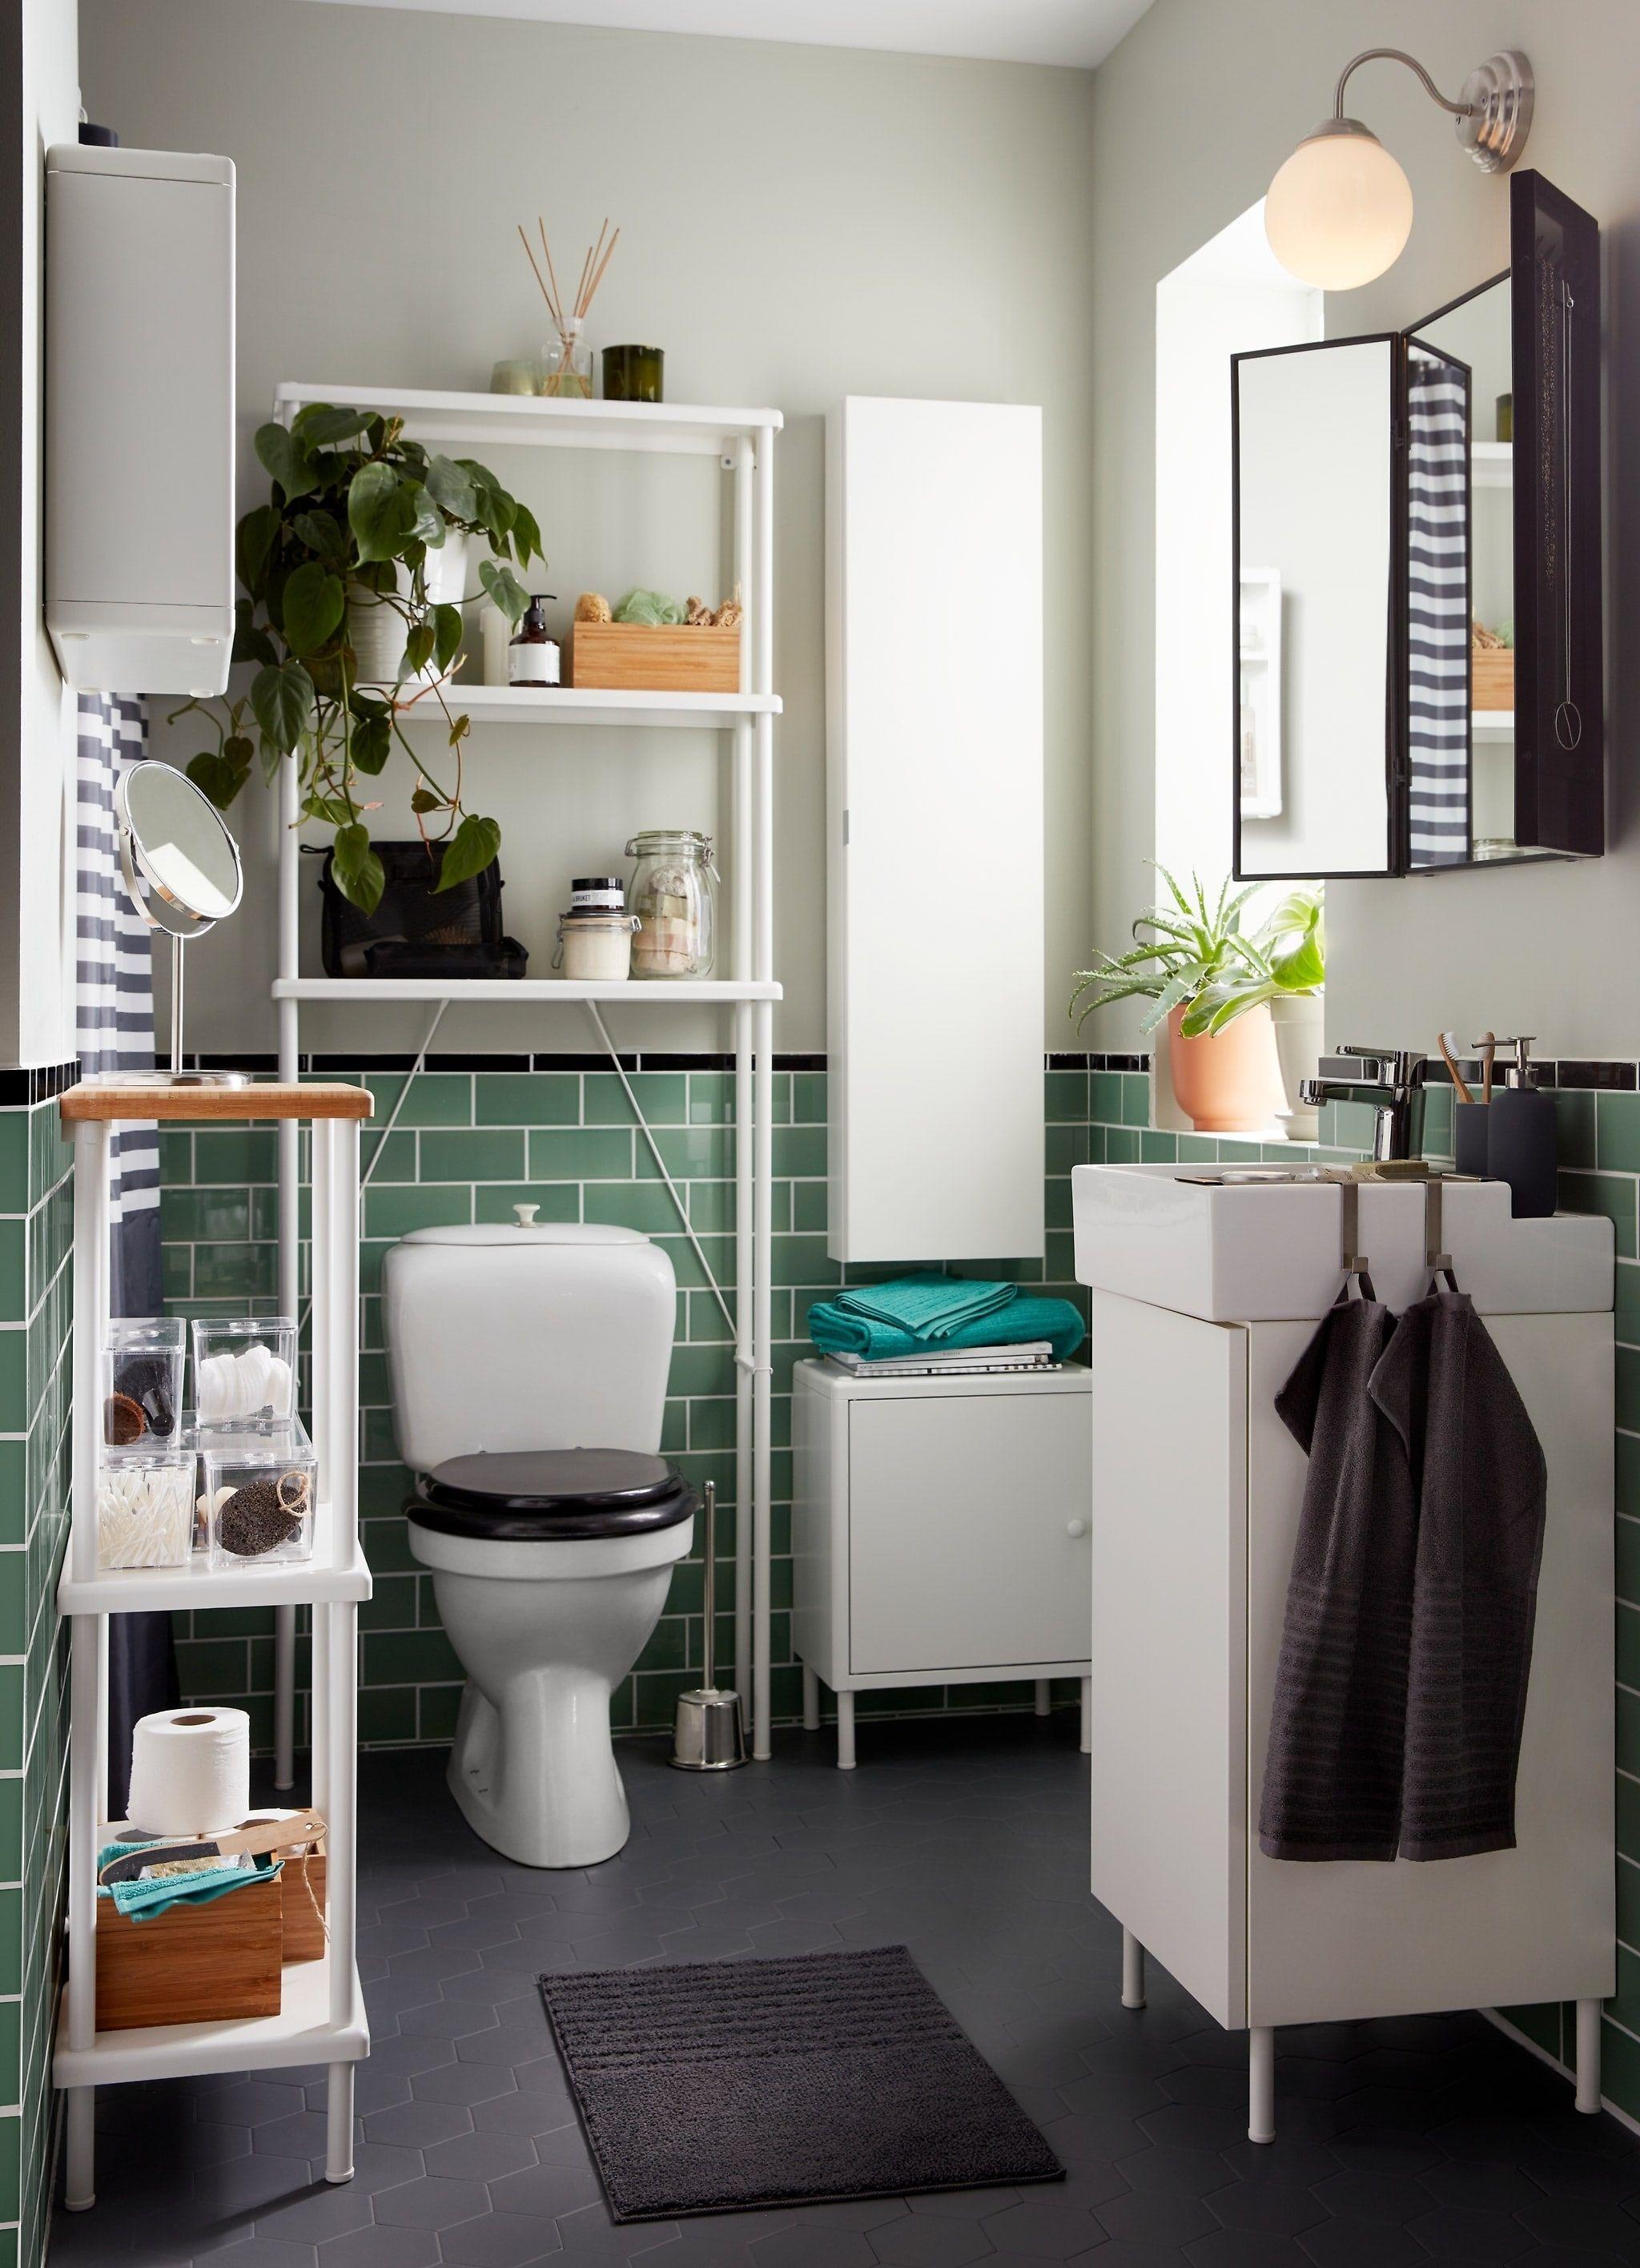 Luxury Inspirational Ikea Small Bathroom Ideas Ij05k1 Https Ijcar 2016 Info Inspirationa Small Bathroom Makeover Small Master Bathroom Small Bathroom Remodel